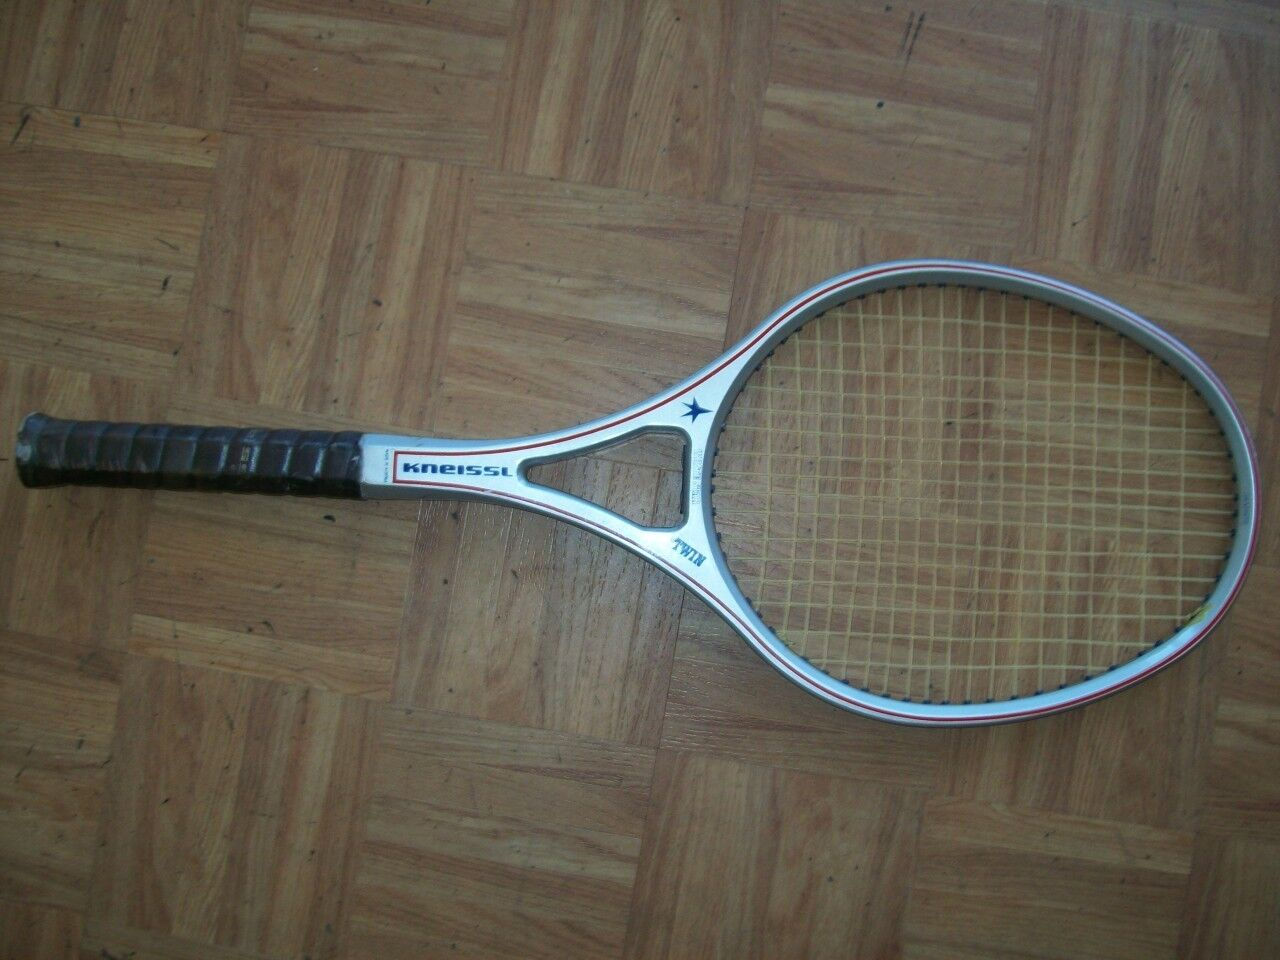 Kneissl bianca bianca bianca Star Twin Graphite Made in Austria 4 1/2 Tennis Racquet 8a6cdb